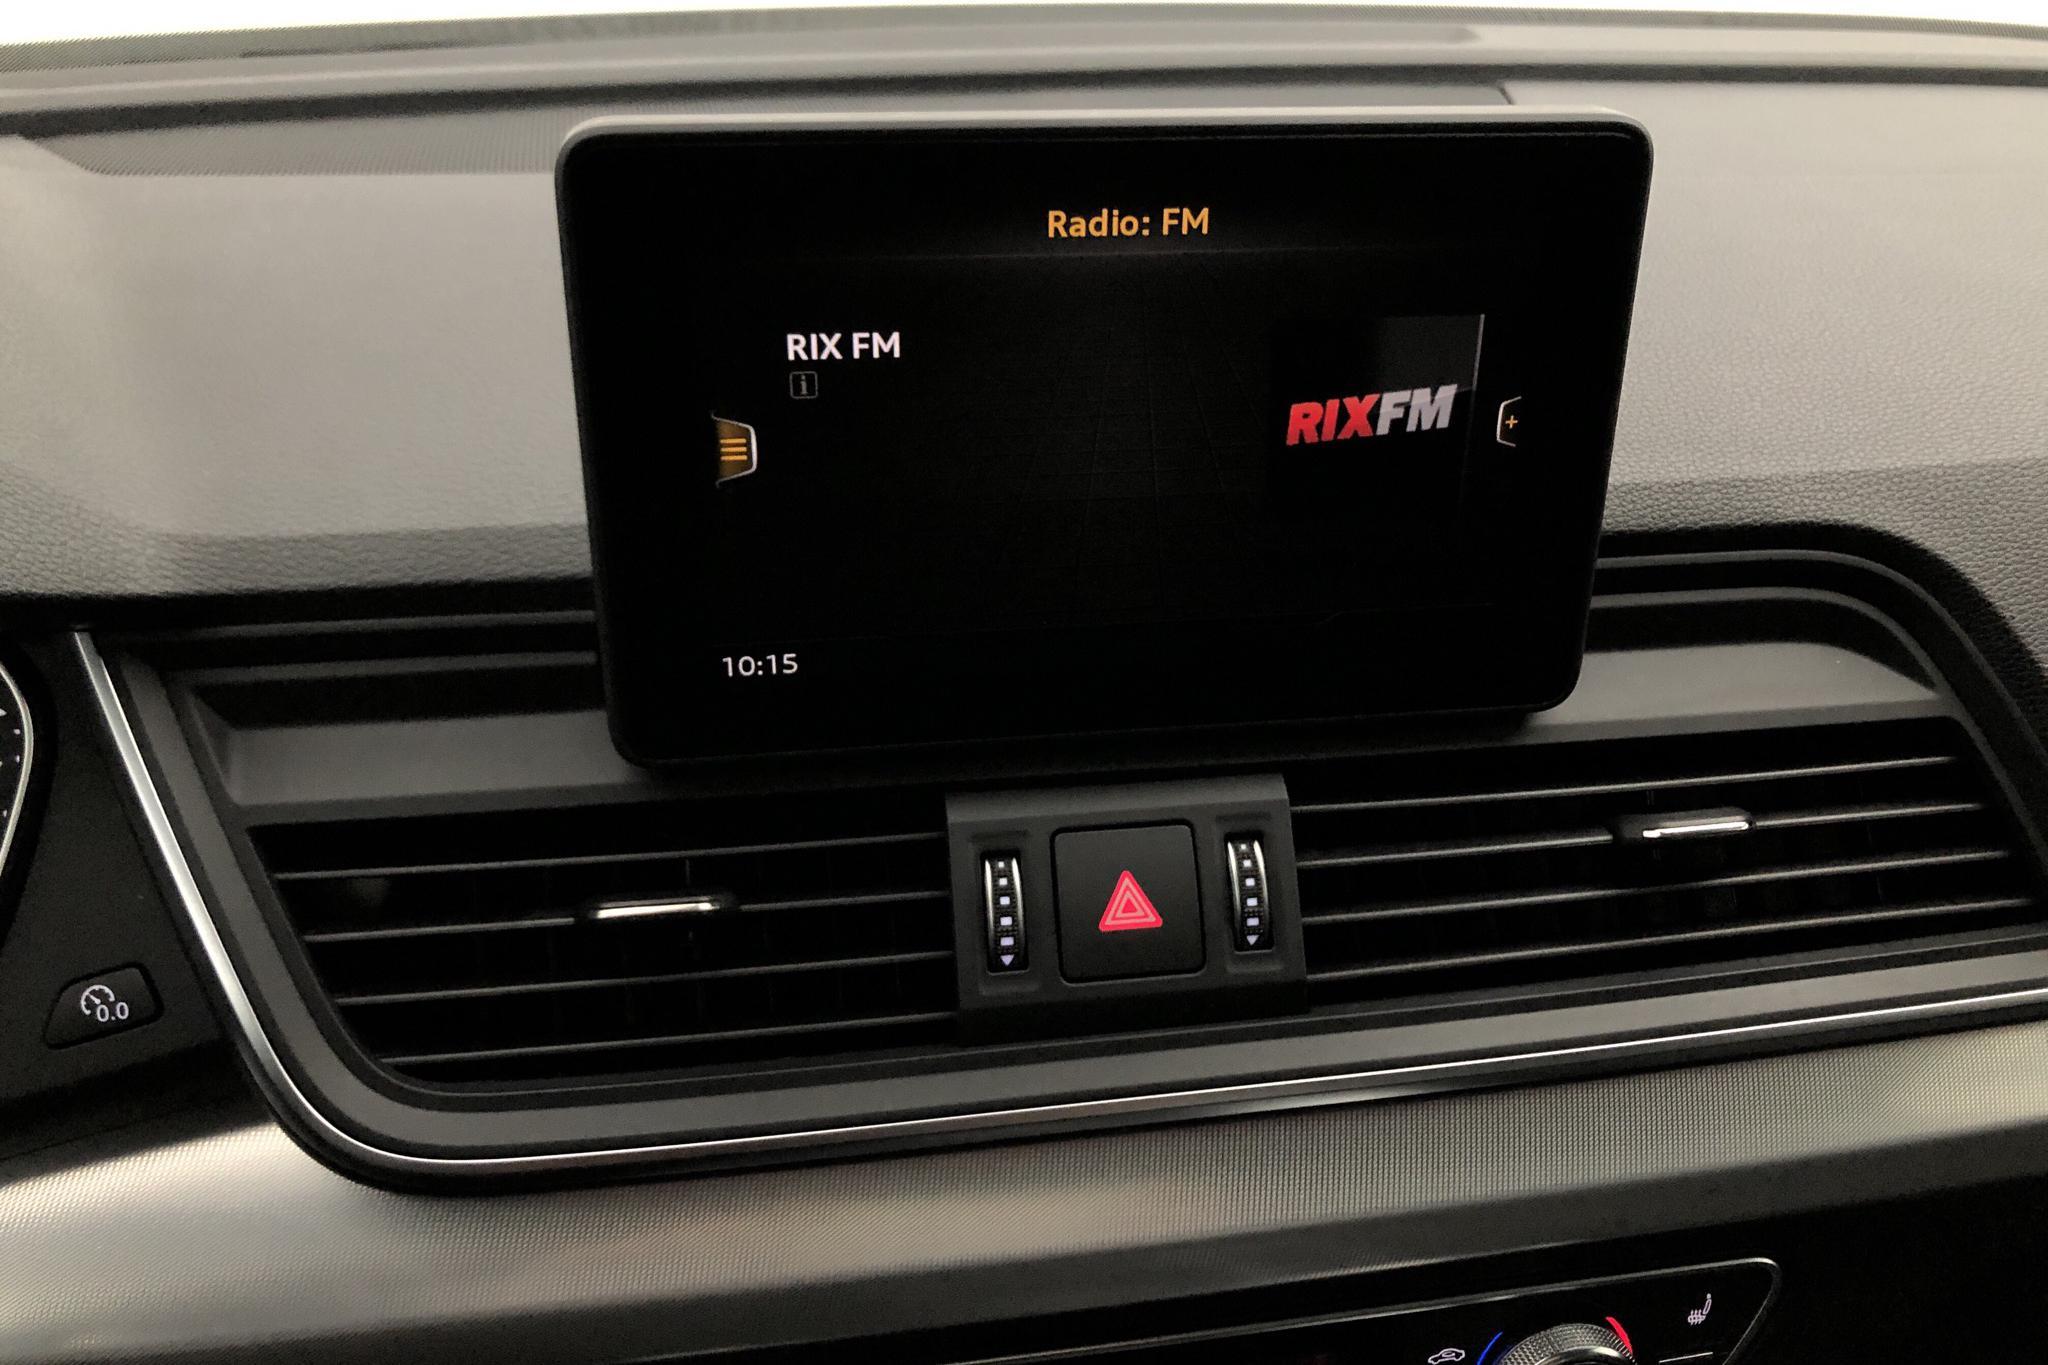 Audi Q5 2.0 TDI quattro (190hk) - 85 930 km - Automatic - silver - 2018